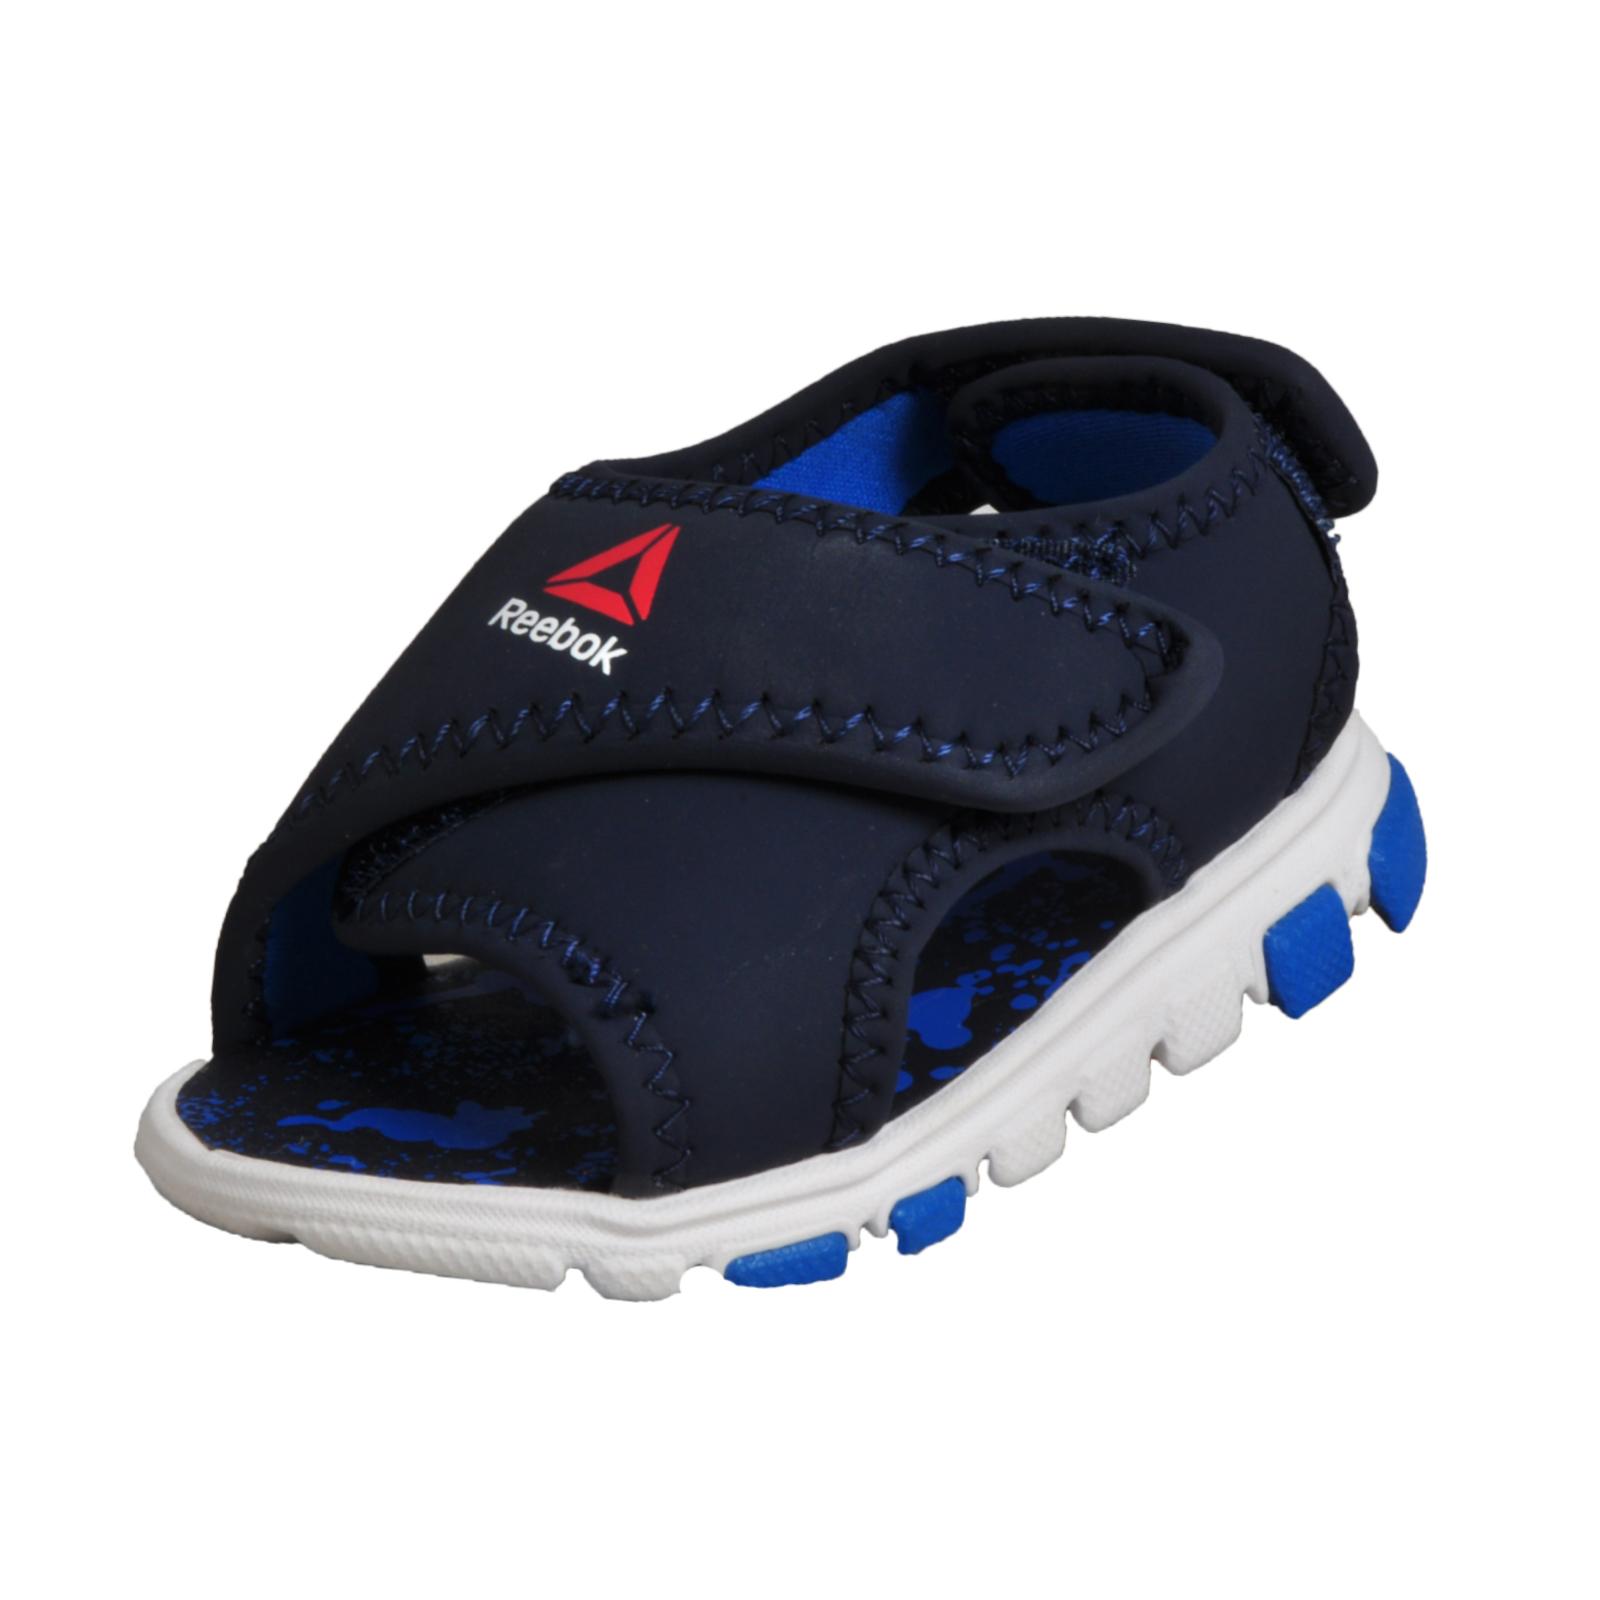 ae6258b5c Details about Reebok Wave Glider Babies Infants Toddlers Summer Sandal Navy